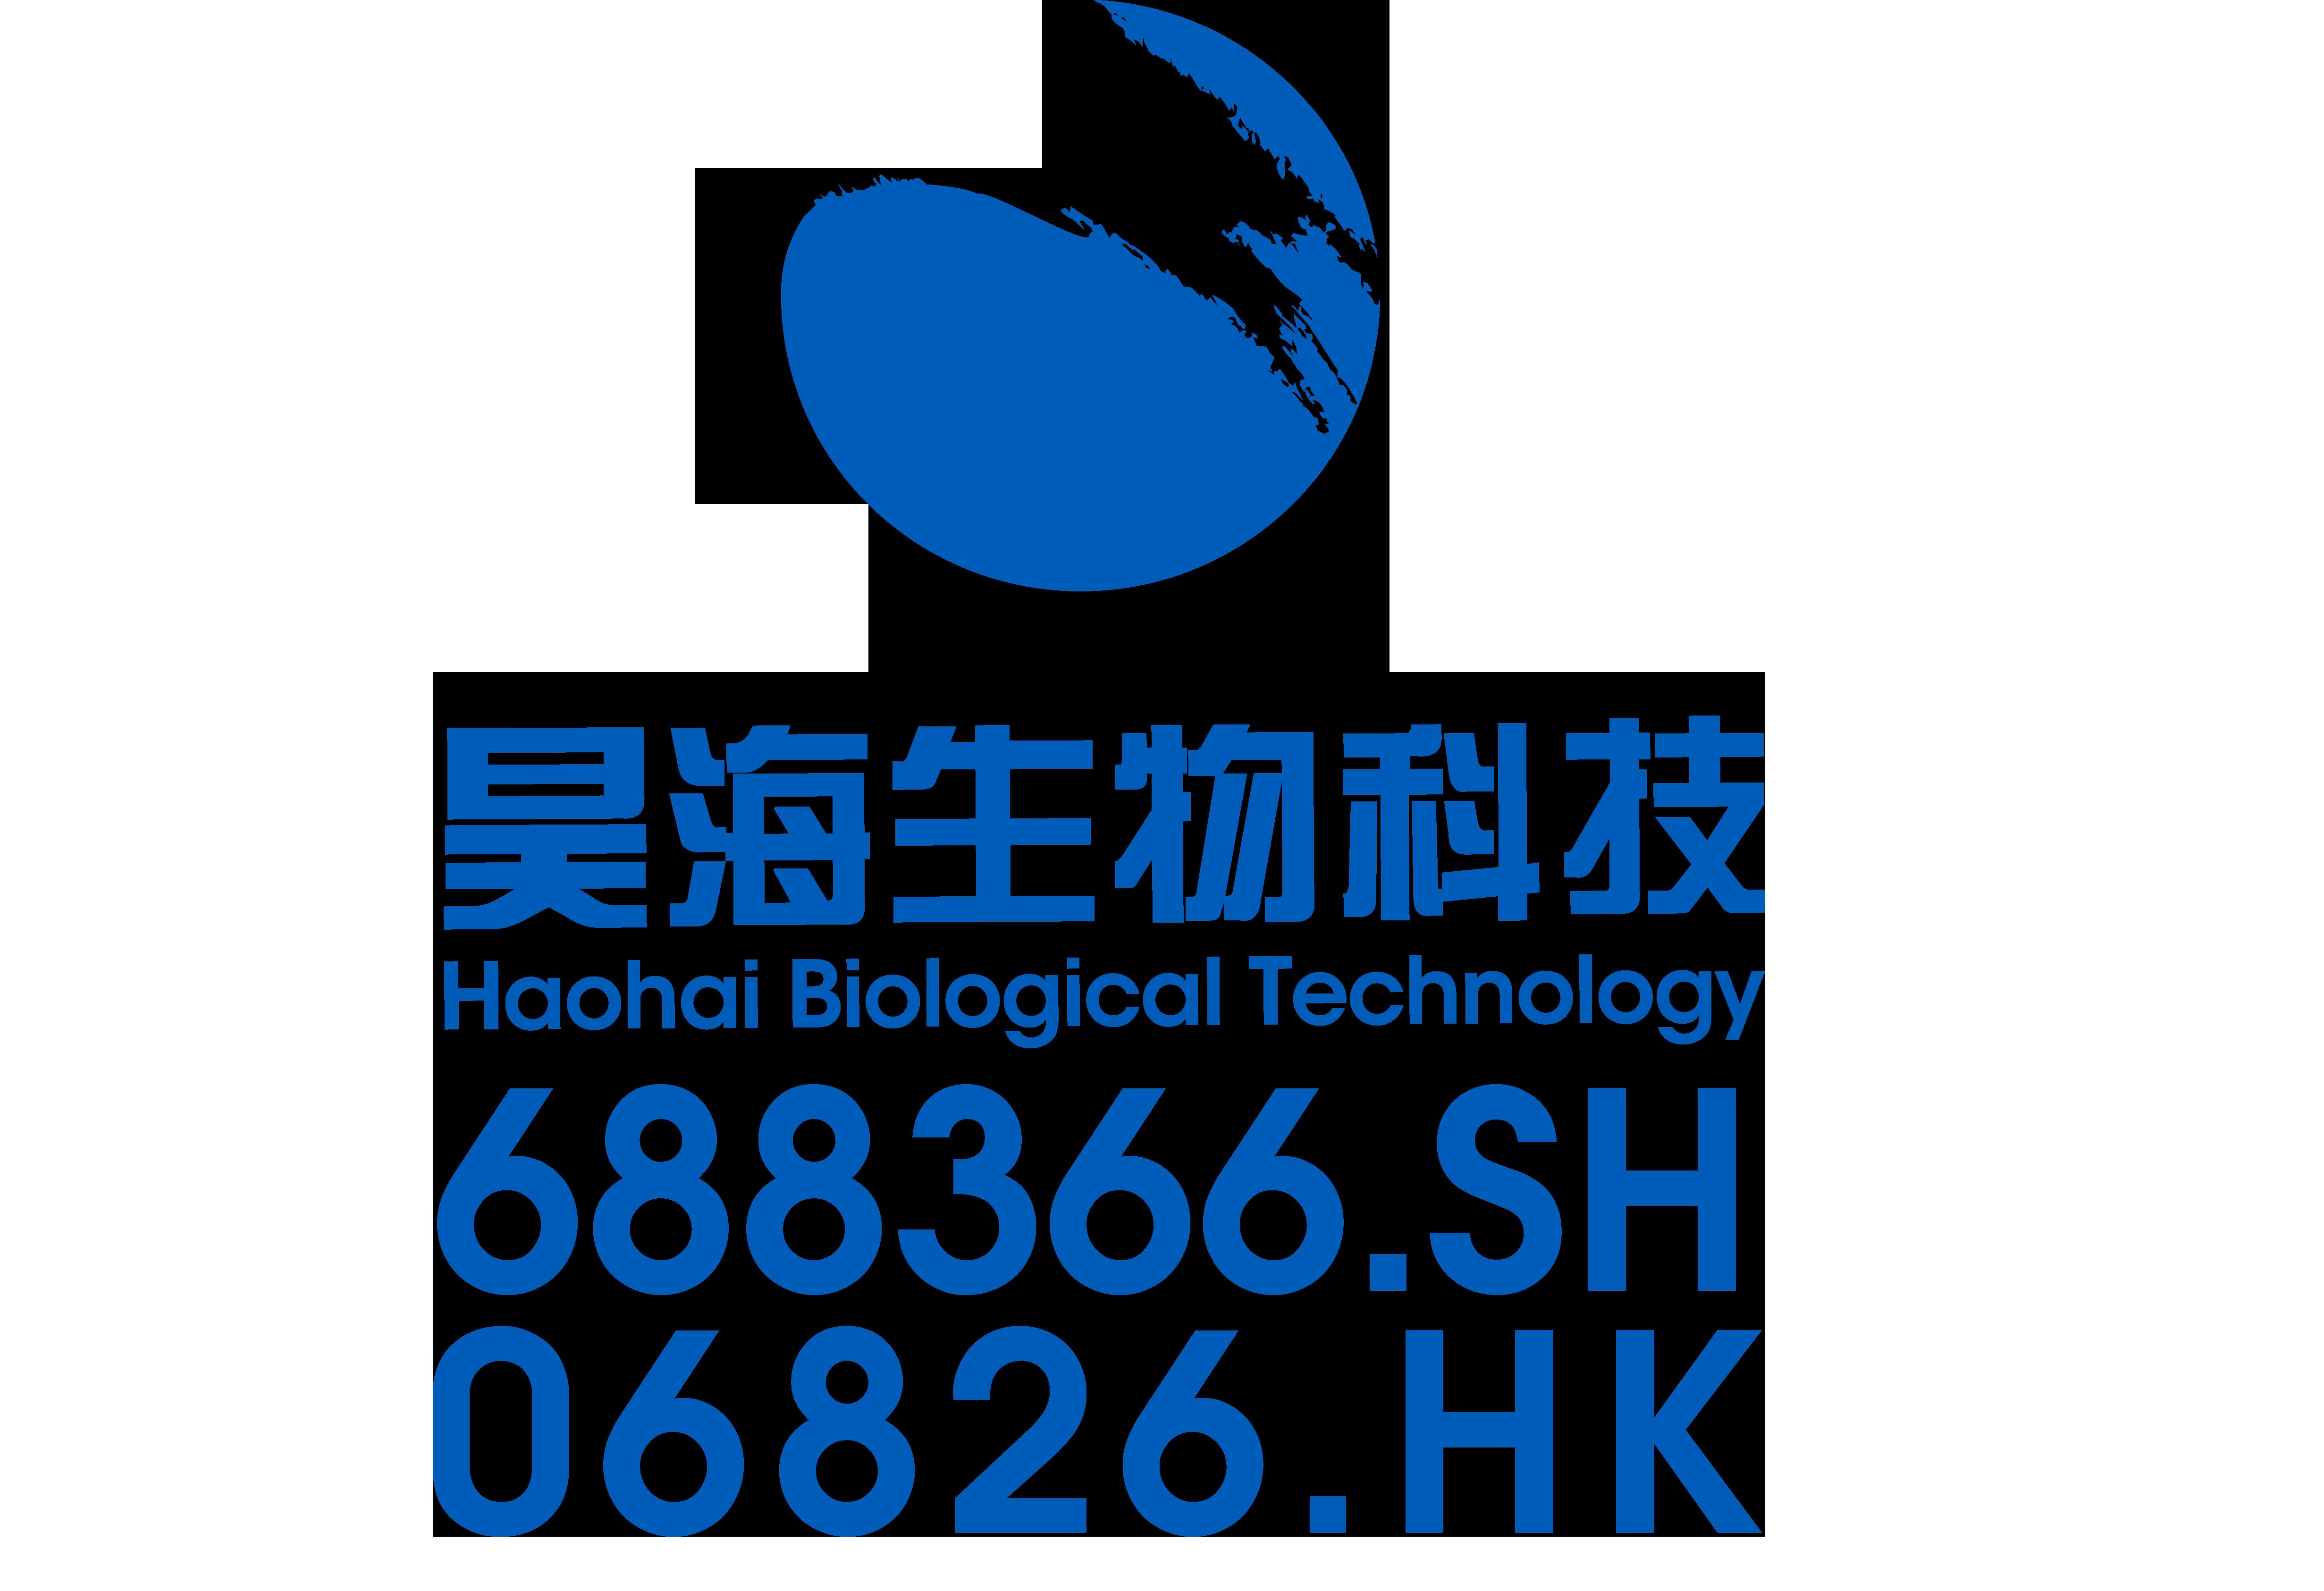 http://manual.pchi-china.com/highset/file/view/230411752058130434